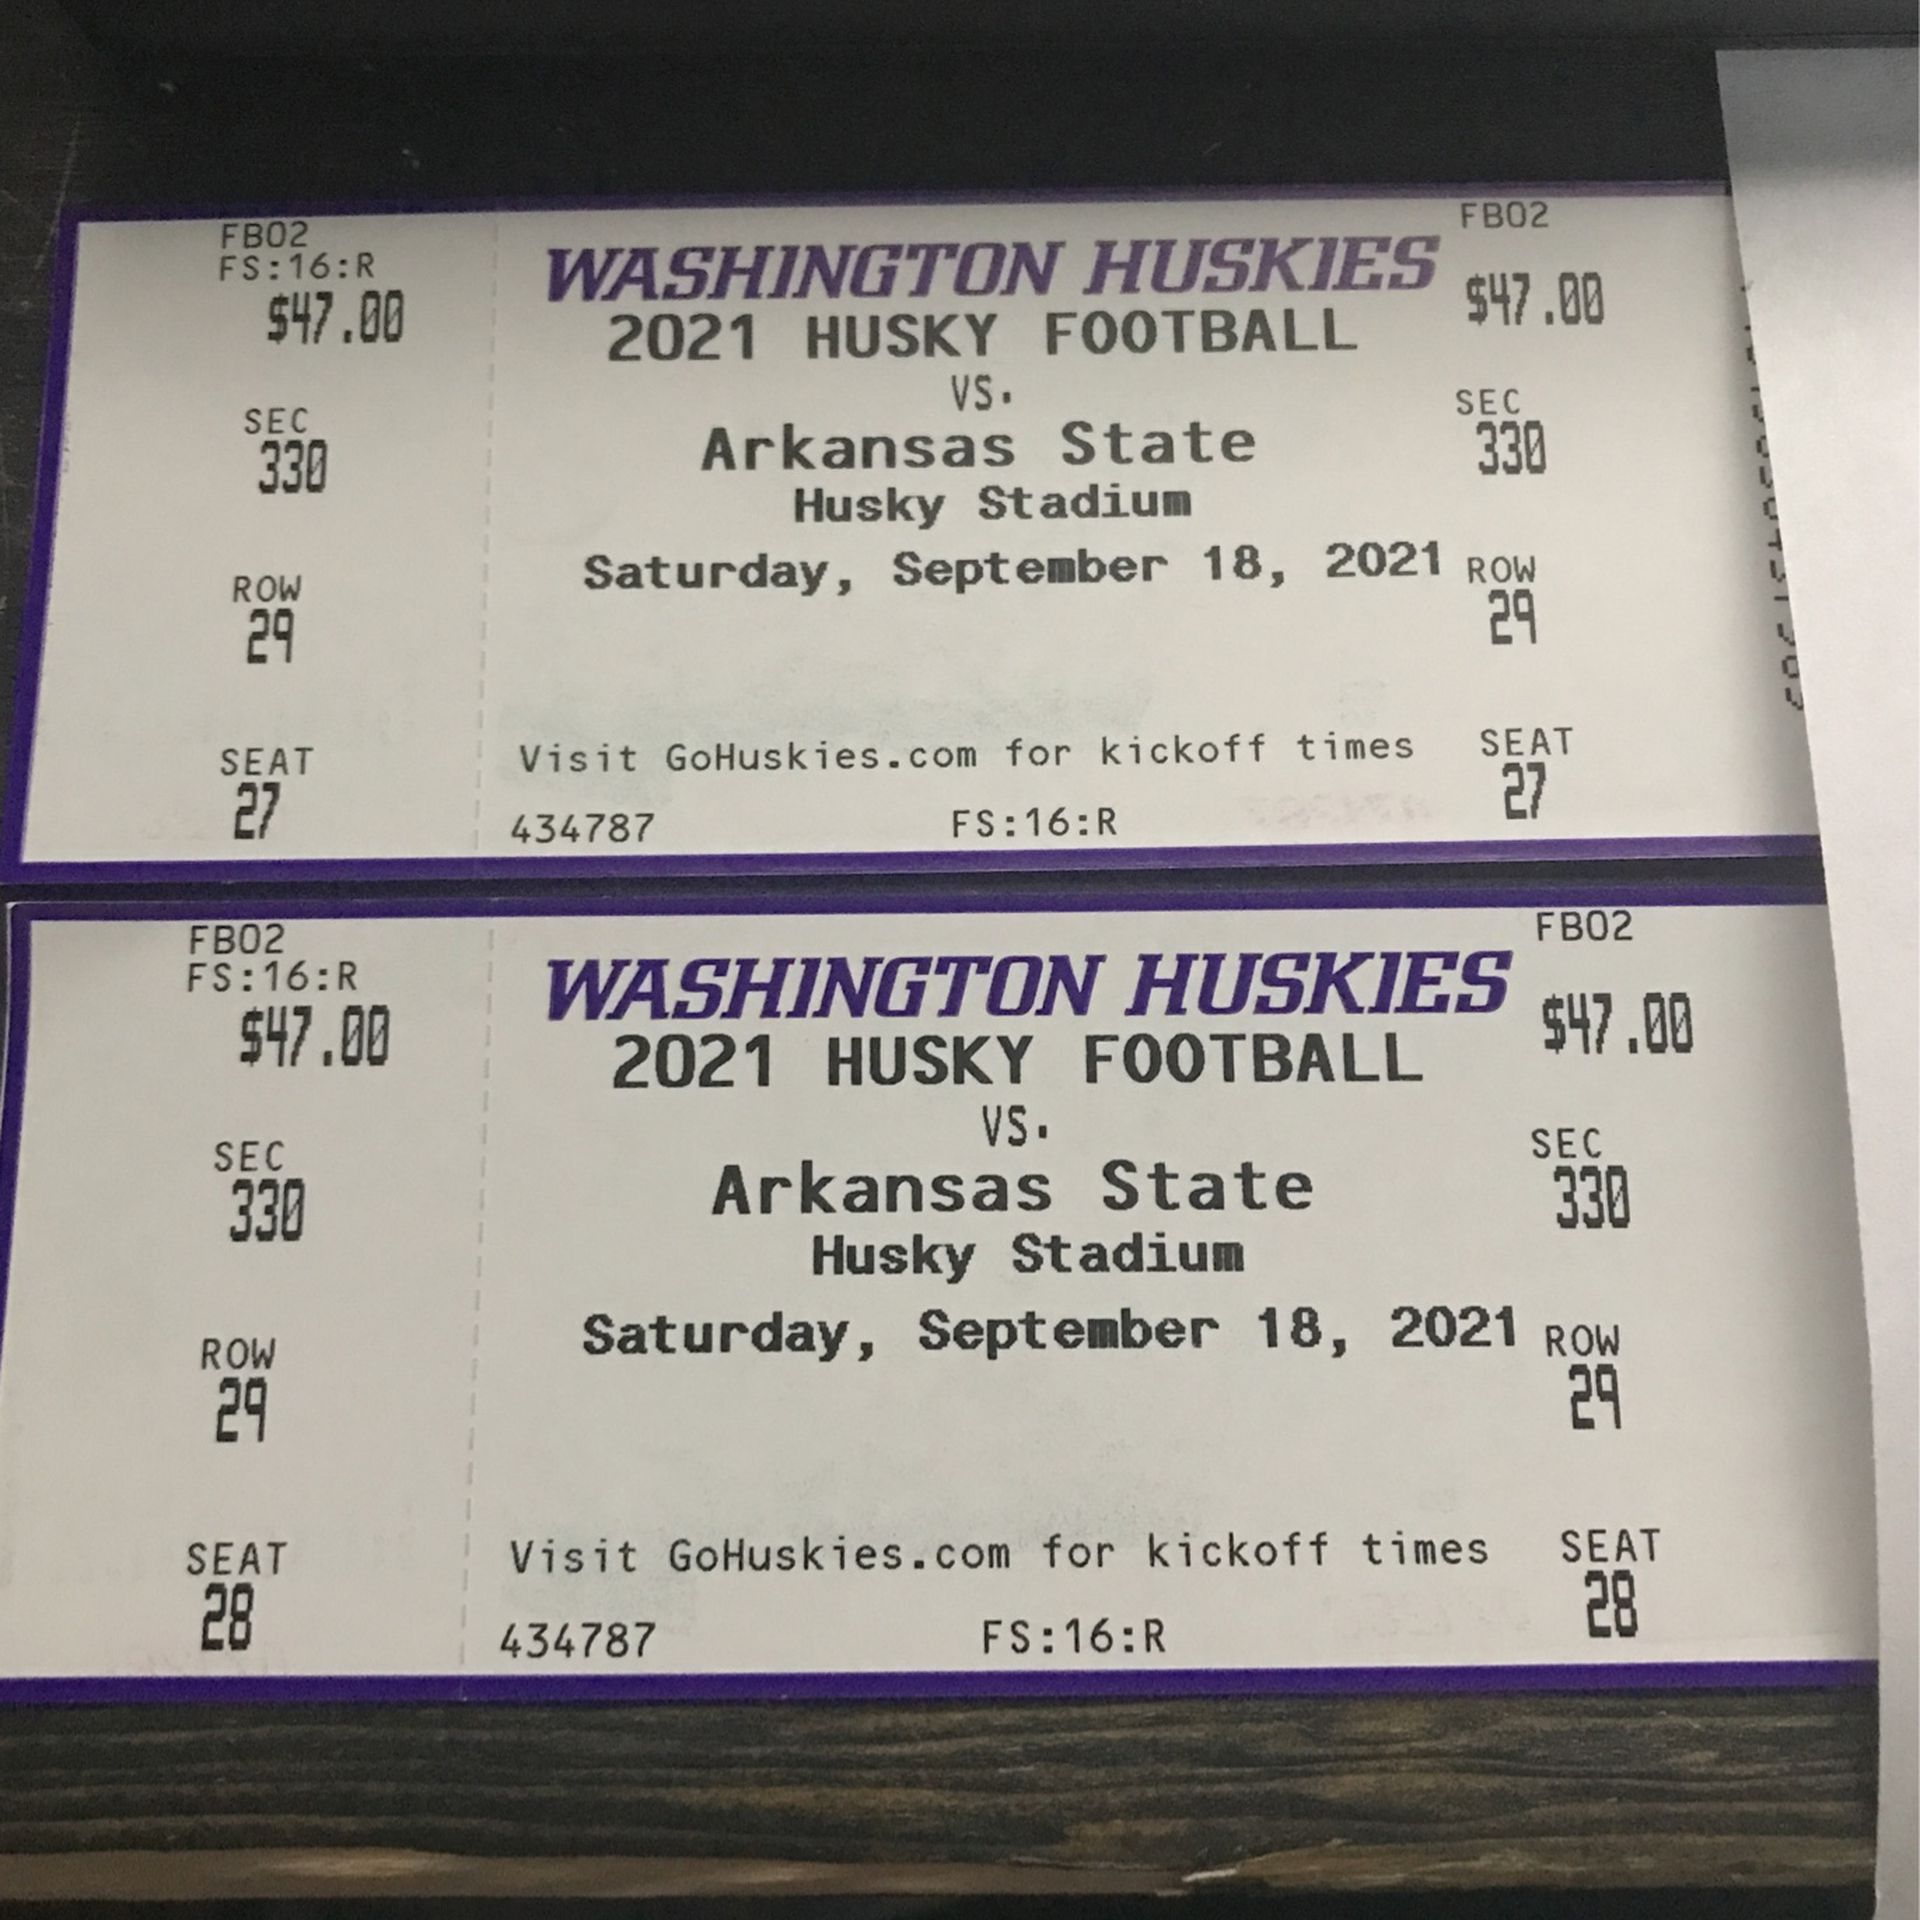 UW Husky Football Tickets / Non-electronic